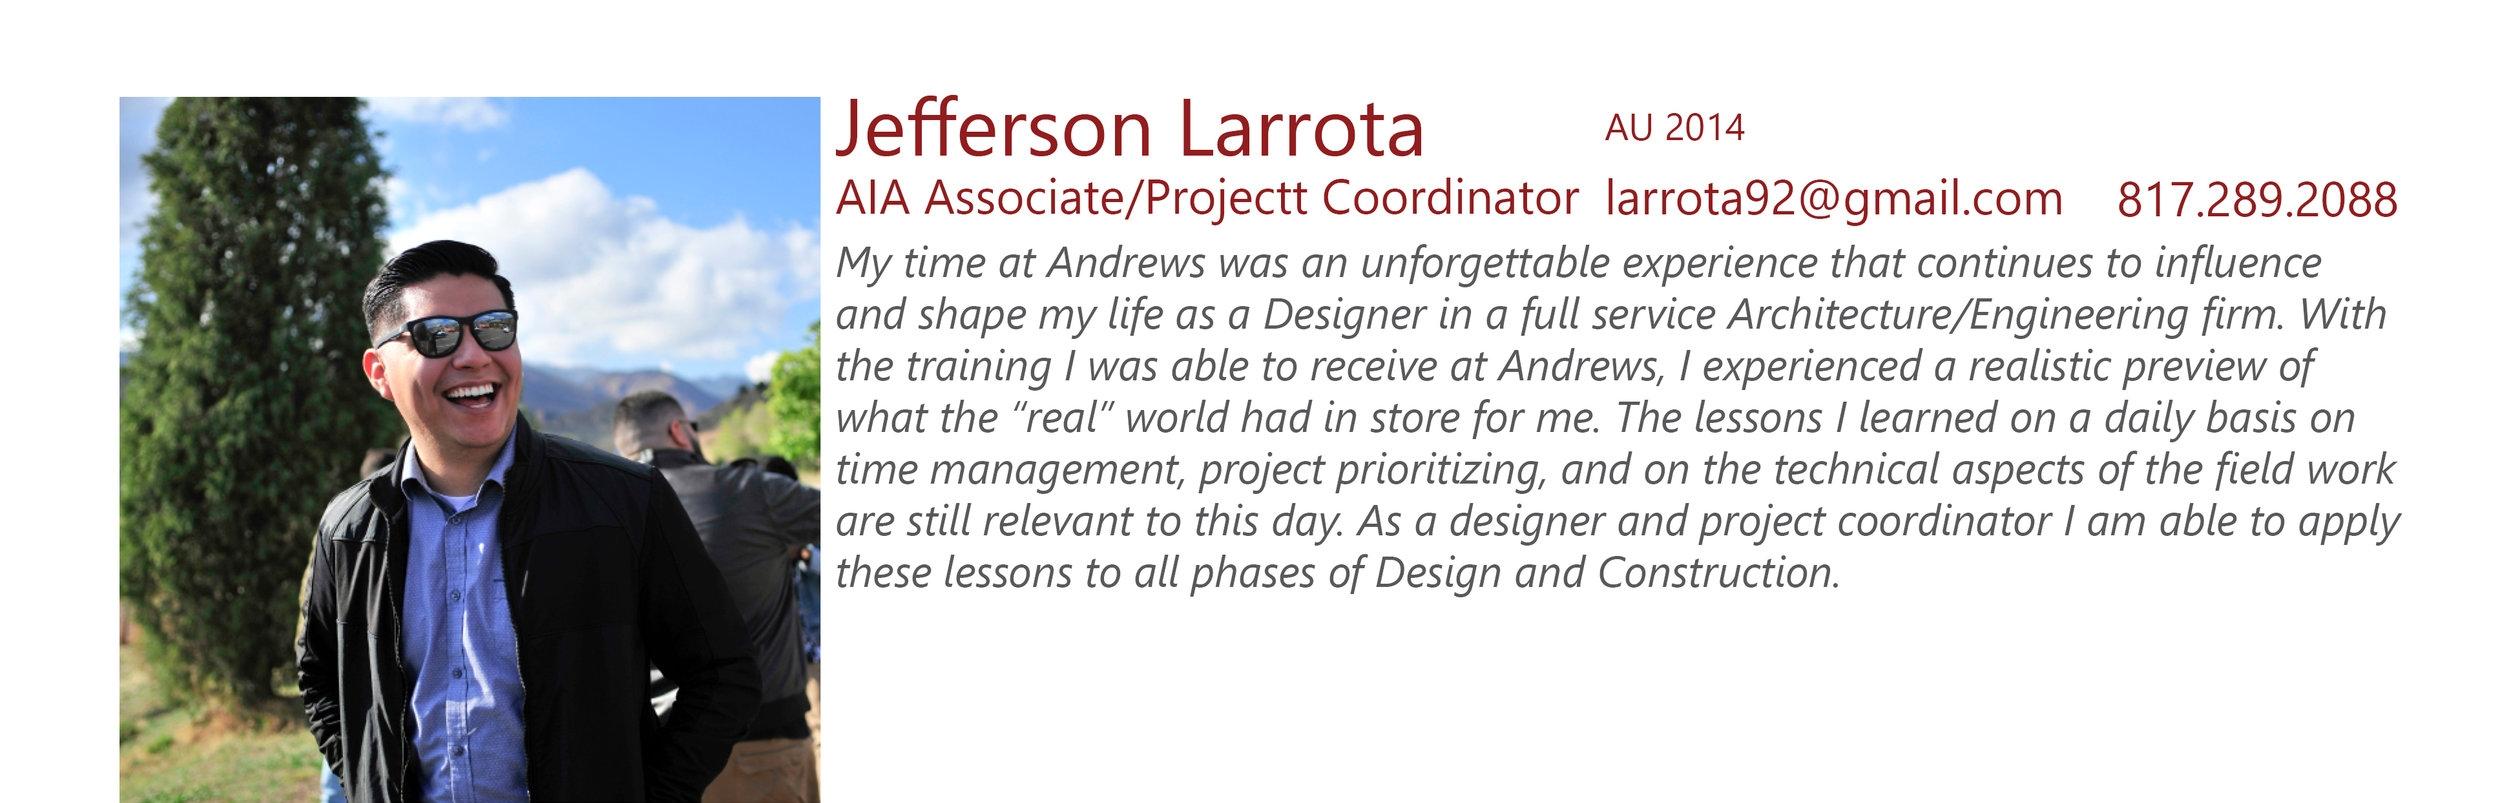 Jefferson Larrota.jpg